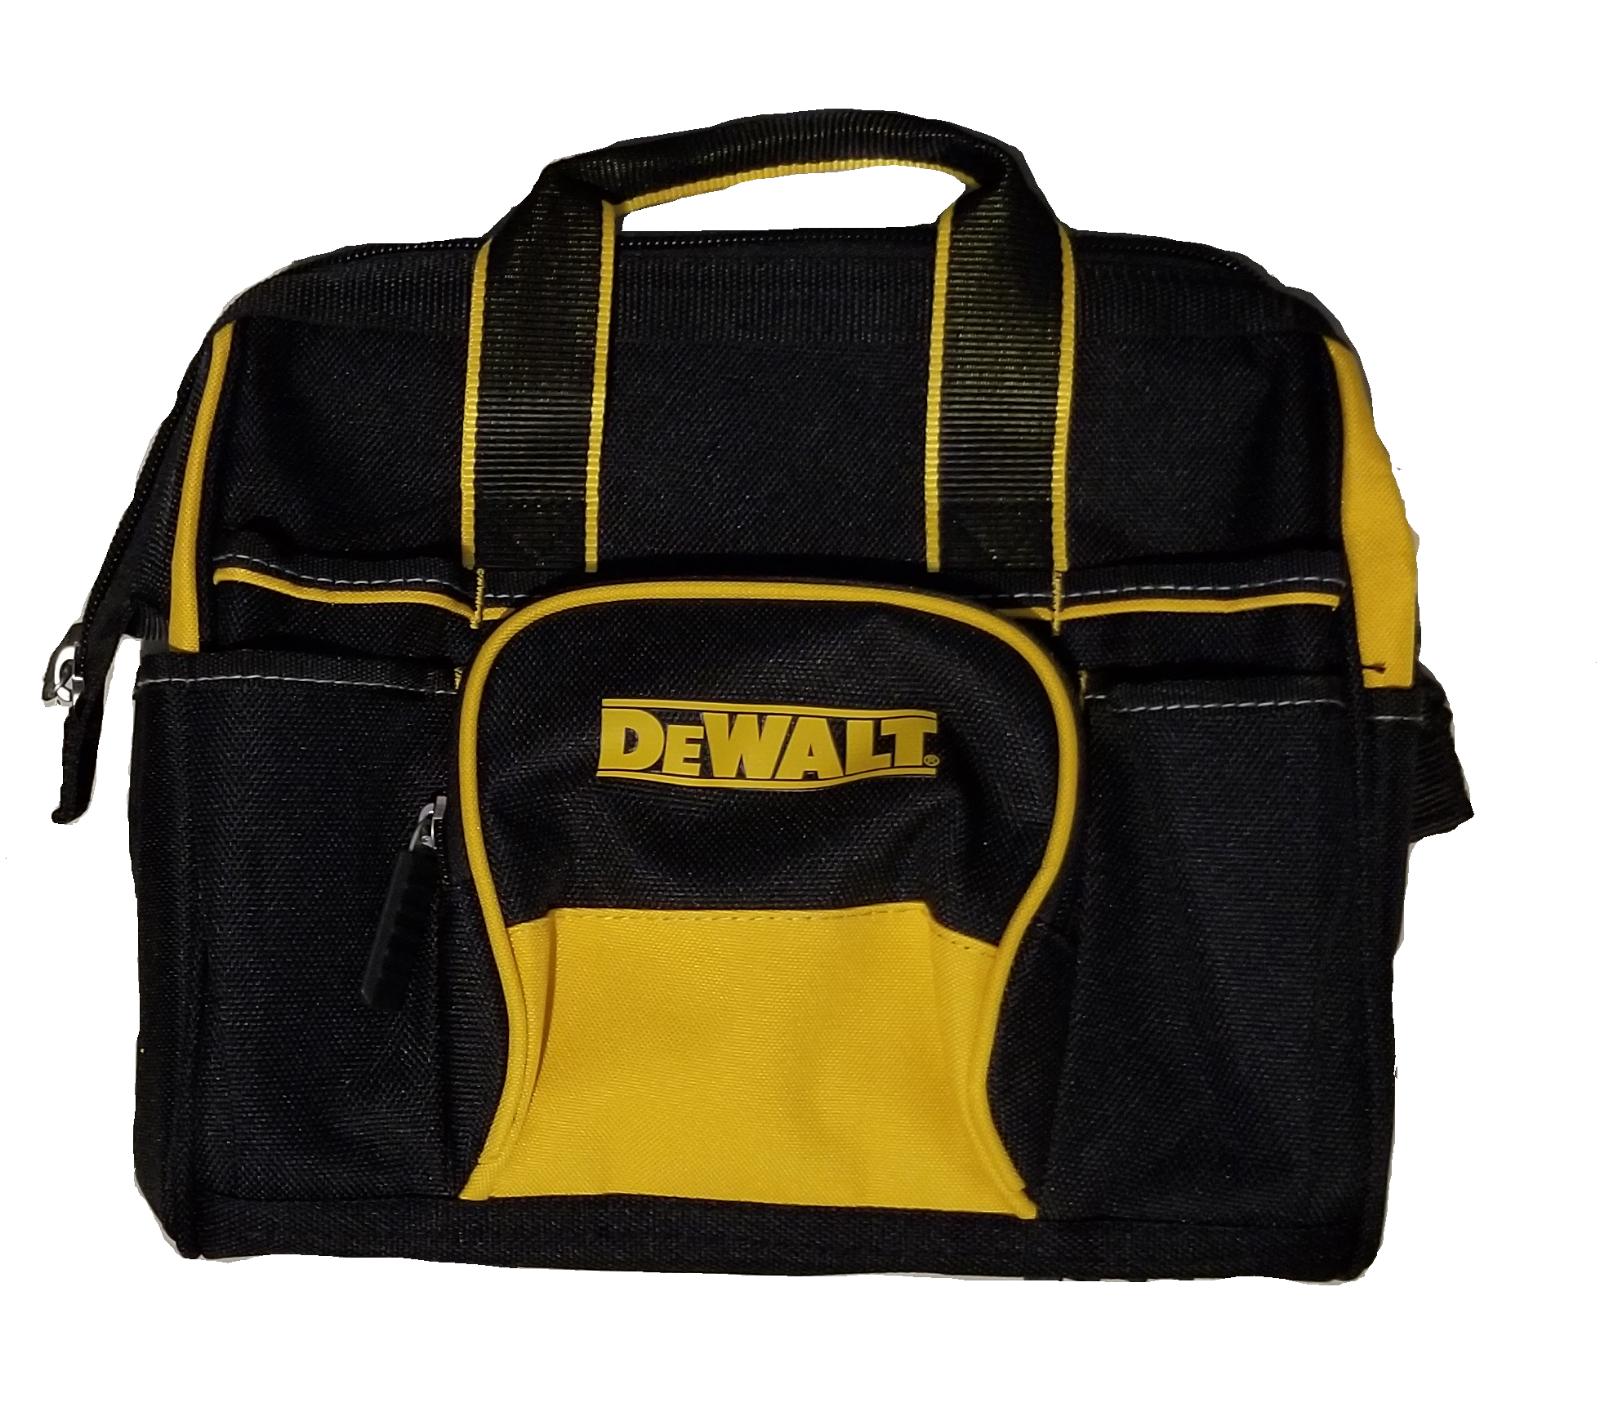 NEW X4 DEWALT 12x10 18 Pocket Heavy Duty Nylon Canvas Contractor Tool Bag